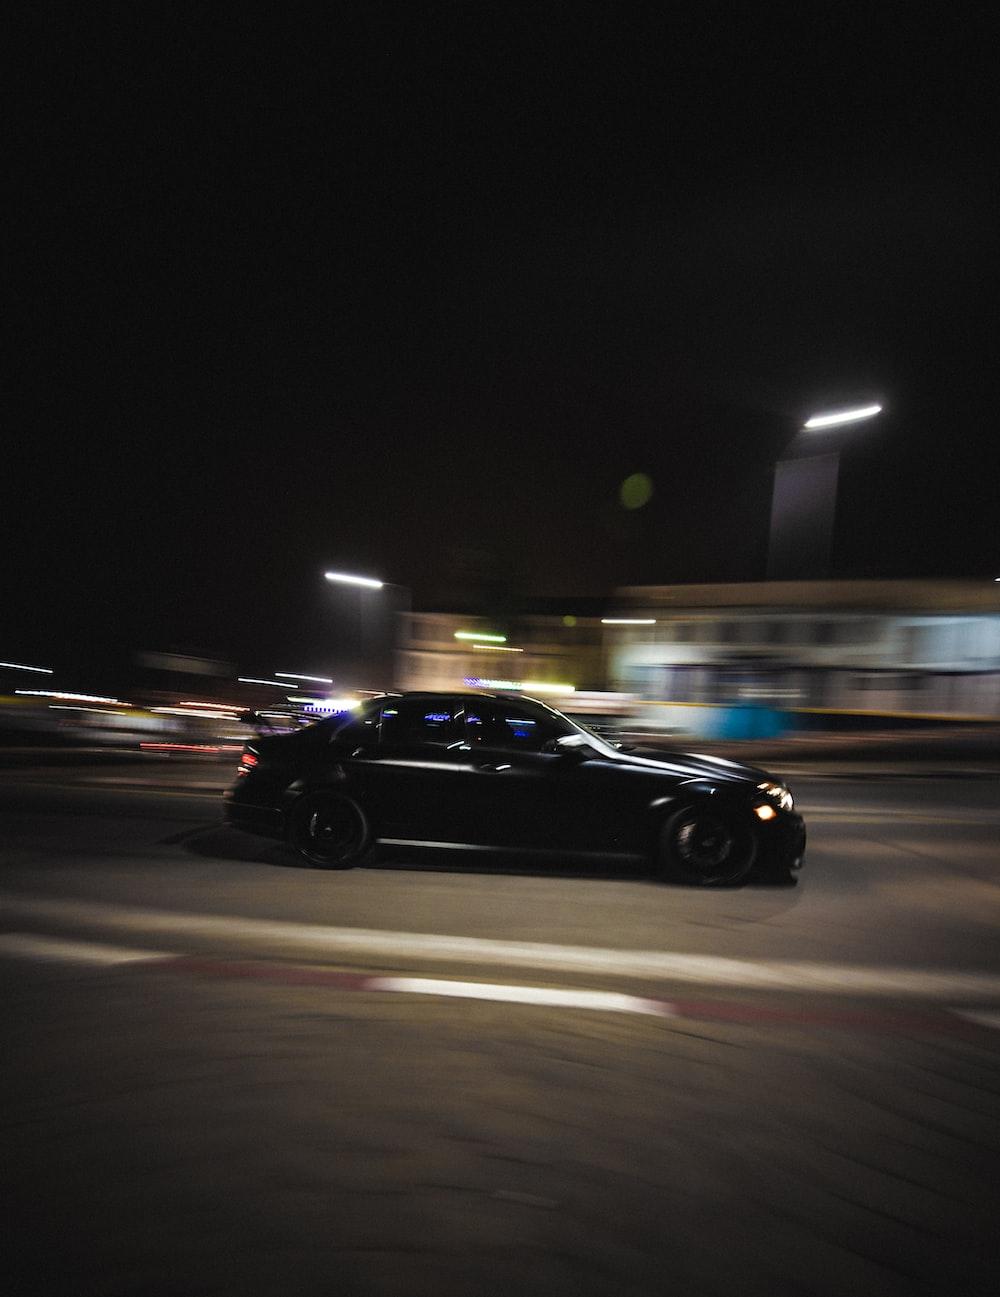 black sedan on road during night time